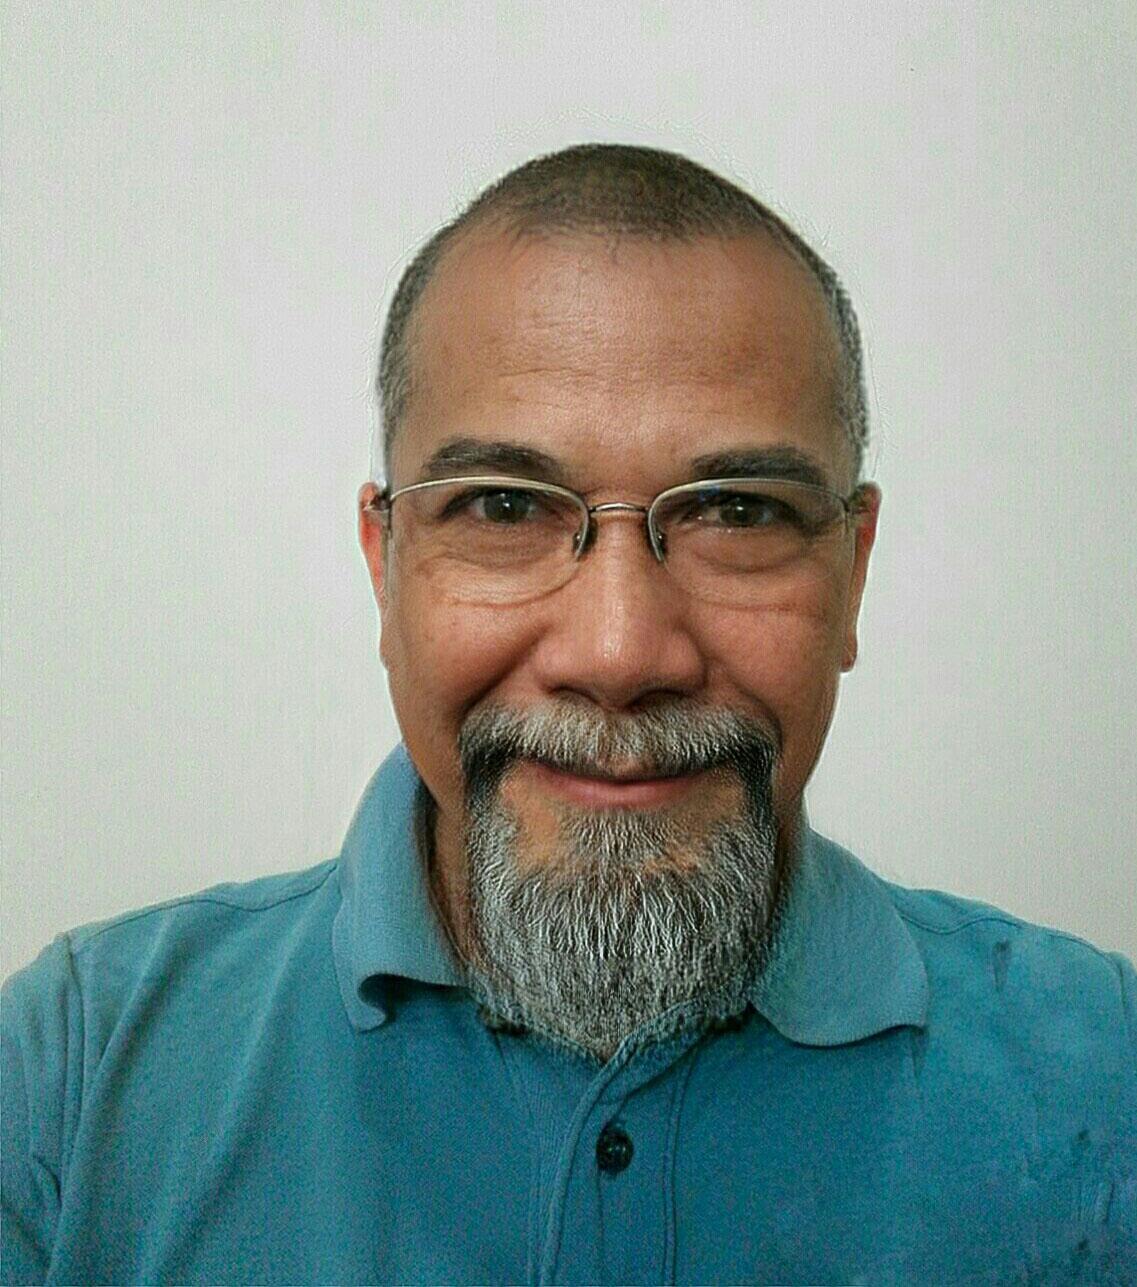 Arthur Shultz